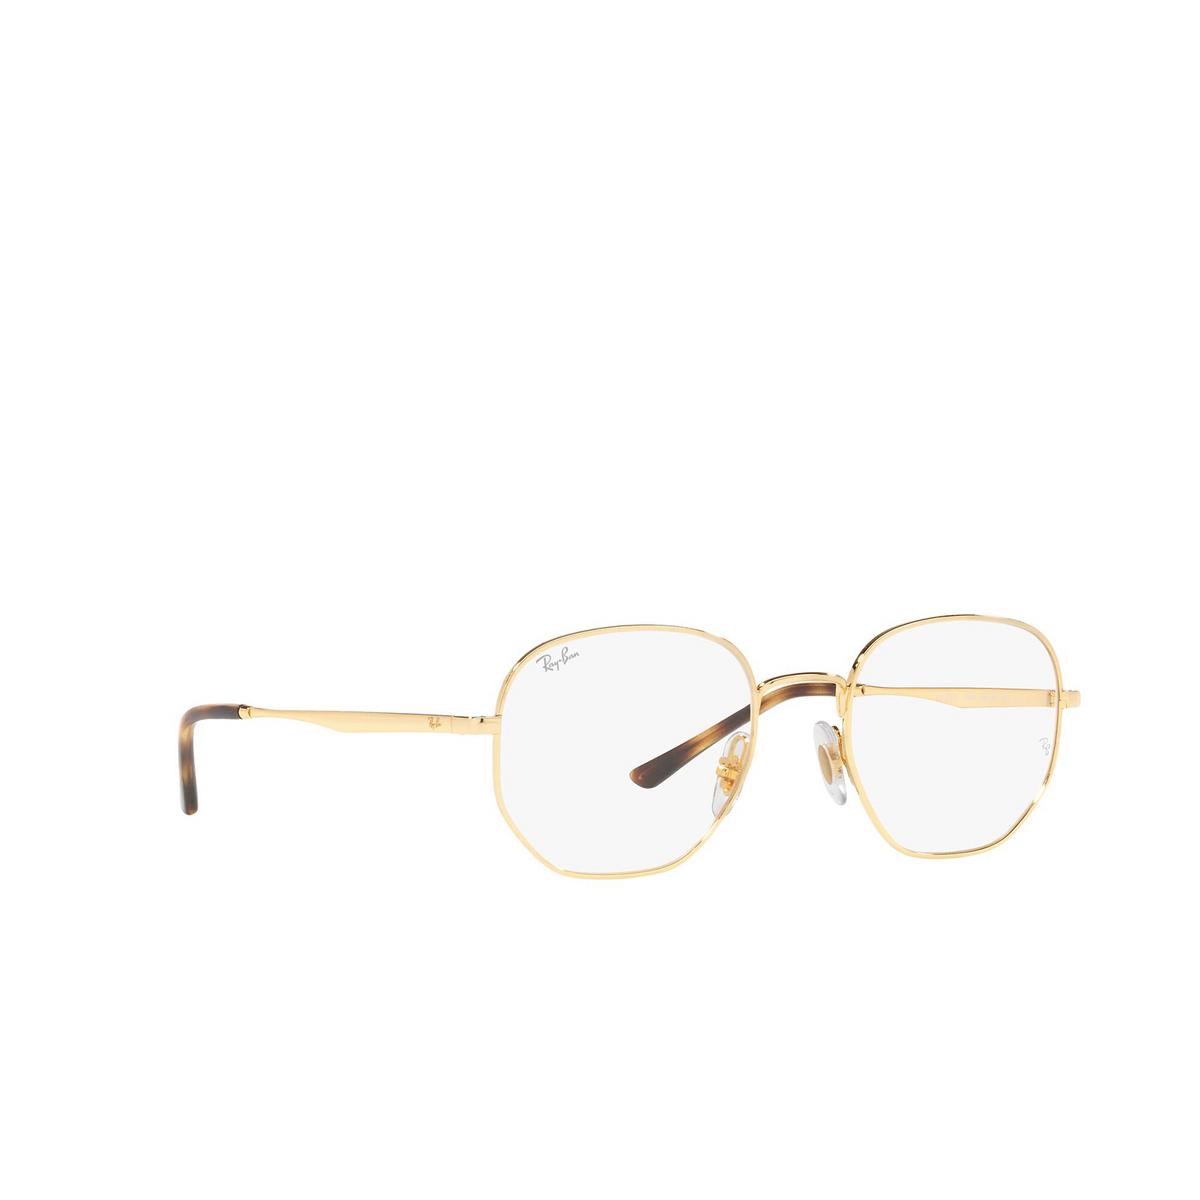 Ray-Ban® Irregular Eyeglasses: RX3682V color Gold 2500 - three-quarters view.